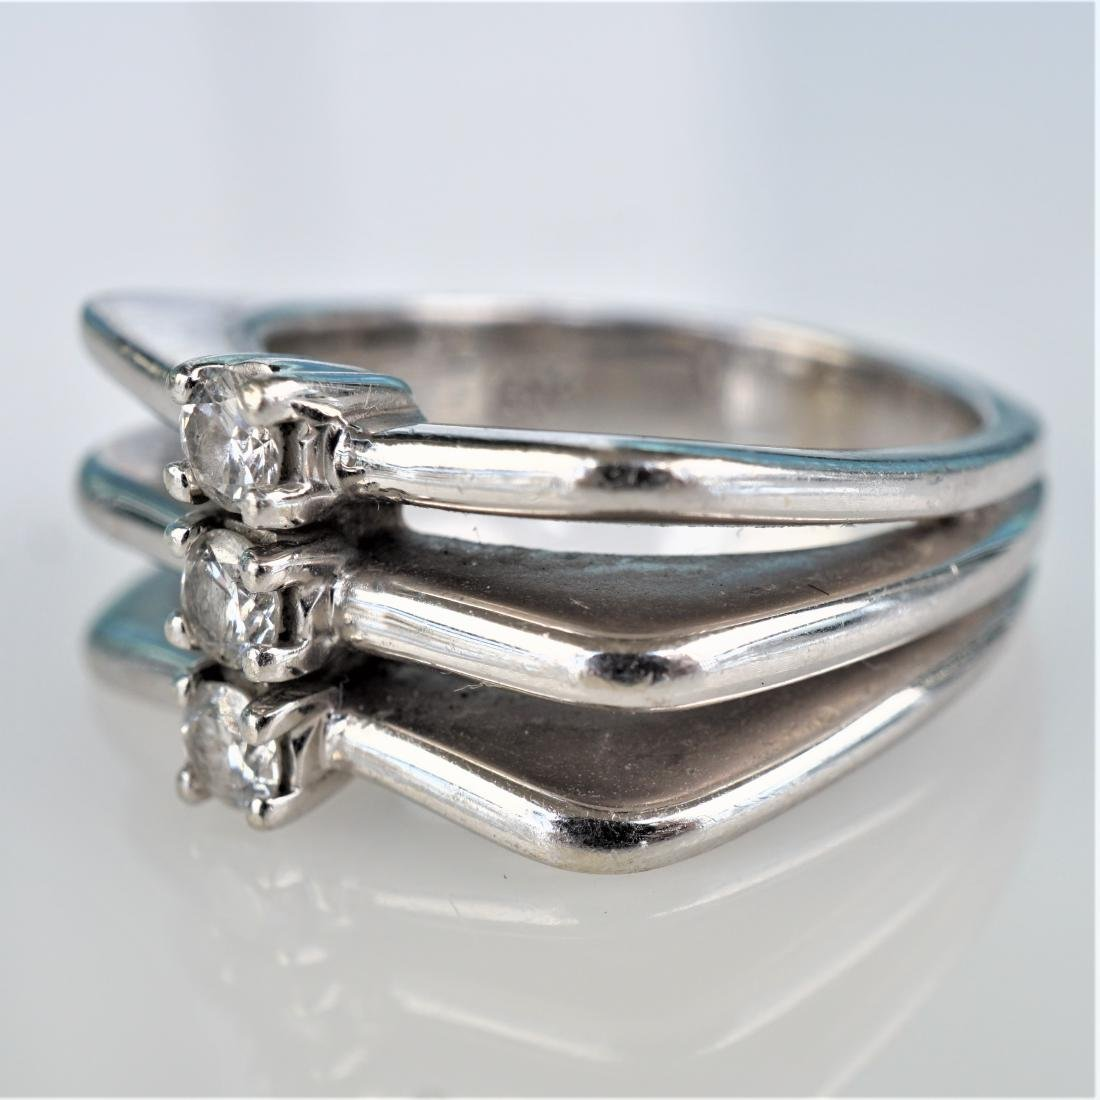 Modernist 14k WG Diamond Ring sz 6.5